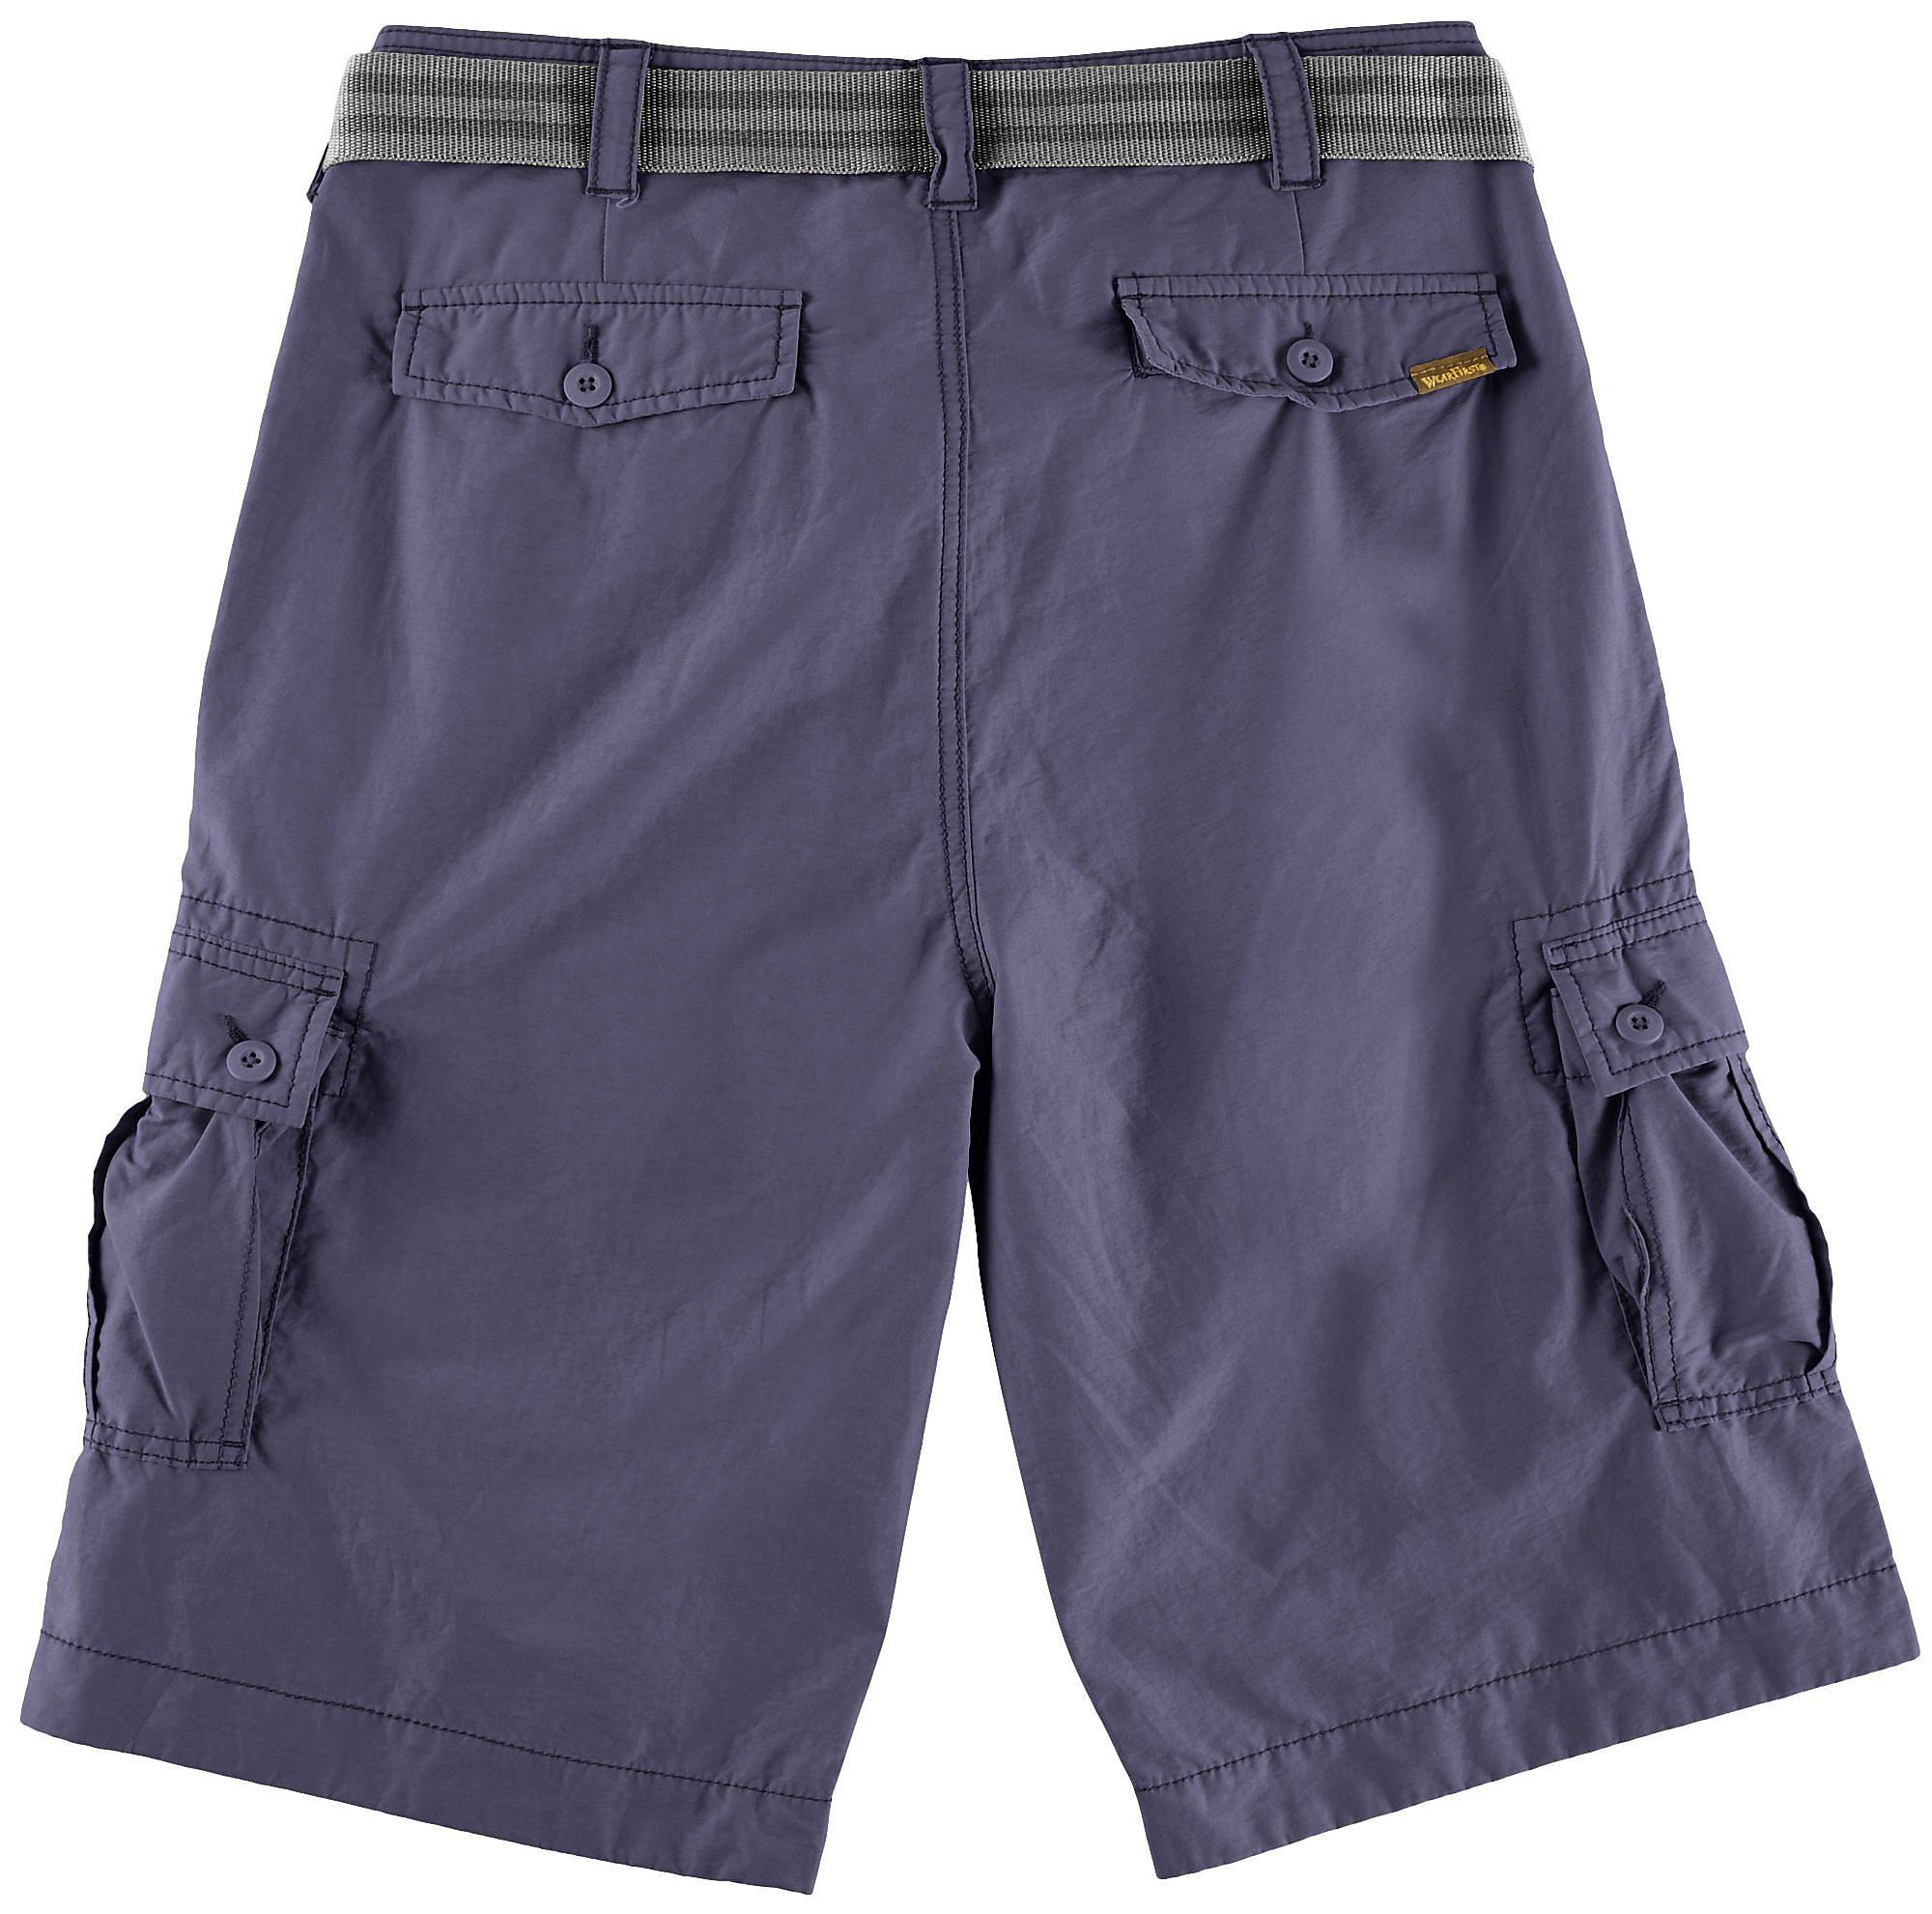 29fdabbdc5 Wearfirst-Mens-Solid-Cargo-Shorts thumbnail 14